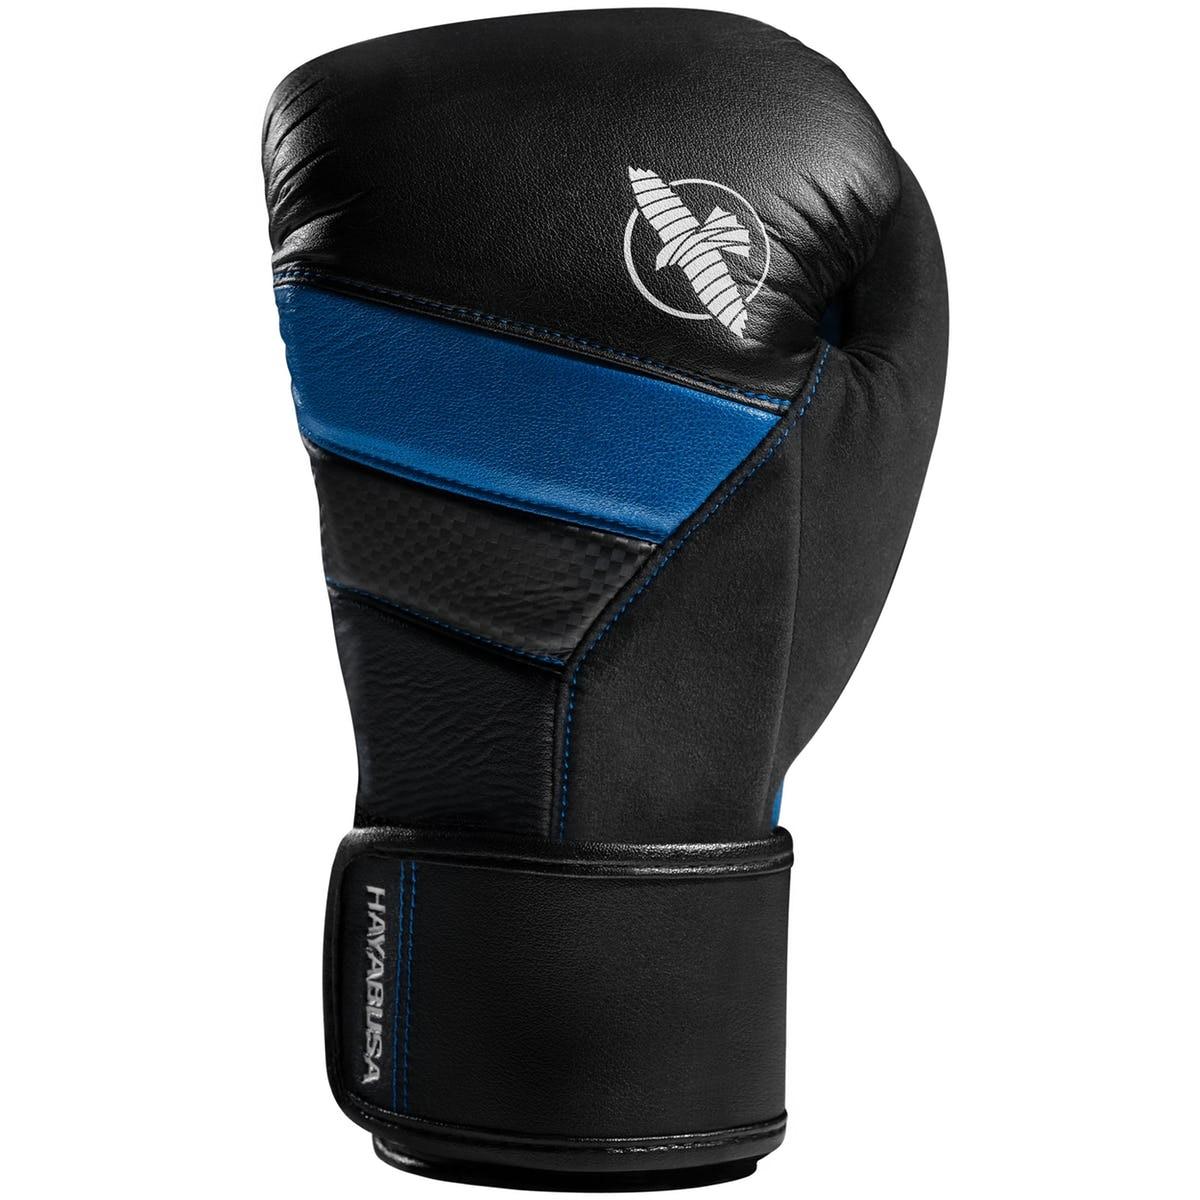 Hayabusa-T3-Dual-X-Hook-and-Loop-Closure-Vylar-Leather-Training-Boxing-Gloves thumbnail 5